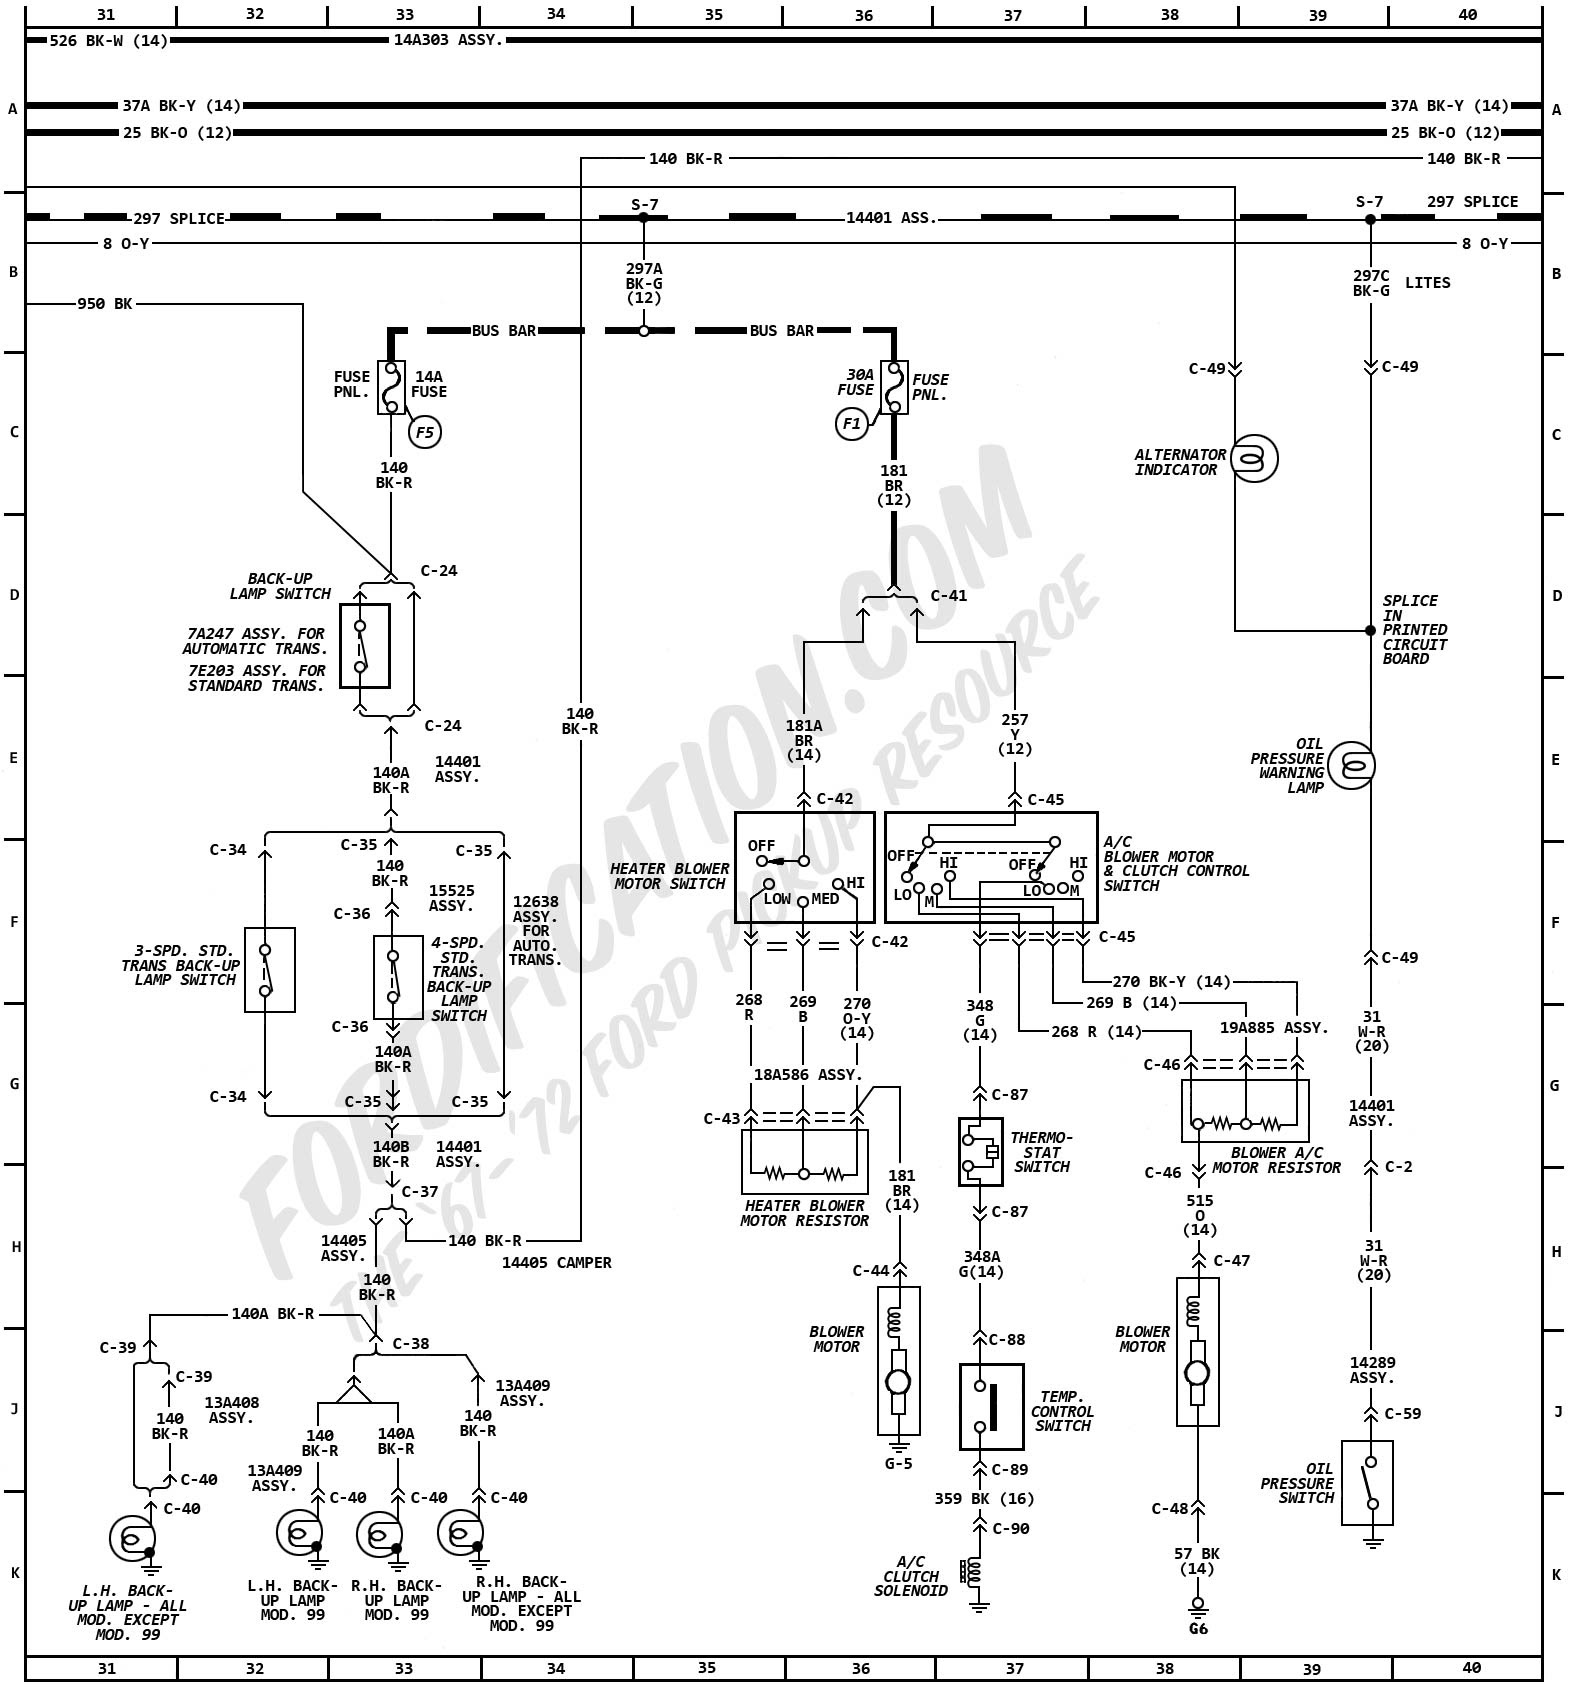 1976 Ford F700 Truck Wiring Diagram 1998 Plymouth Wiring Diagram Begeboy Wiring Diagram Source